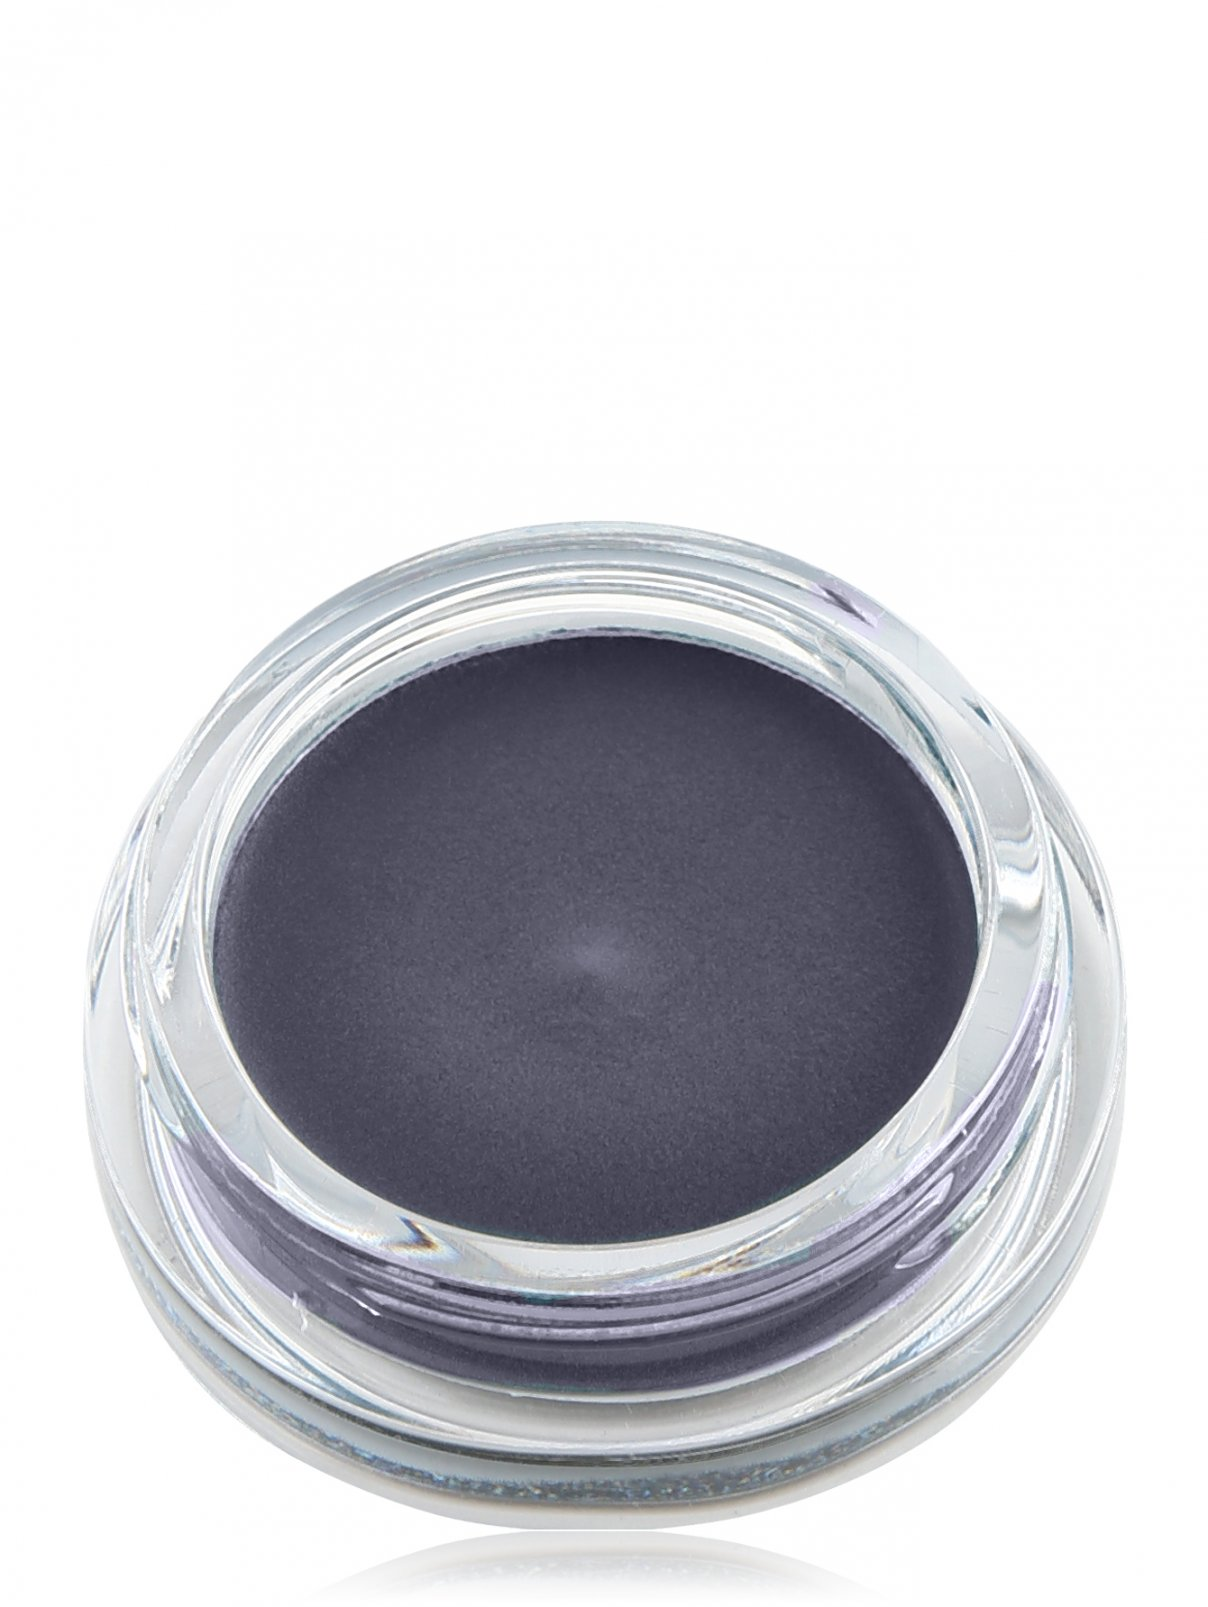 Тени Ombre Satin 04 Makeup Clarins  –  Общий вид